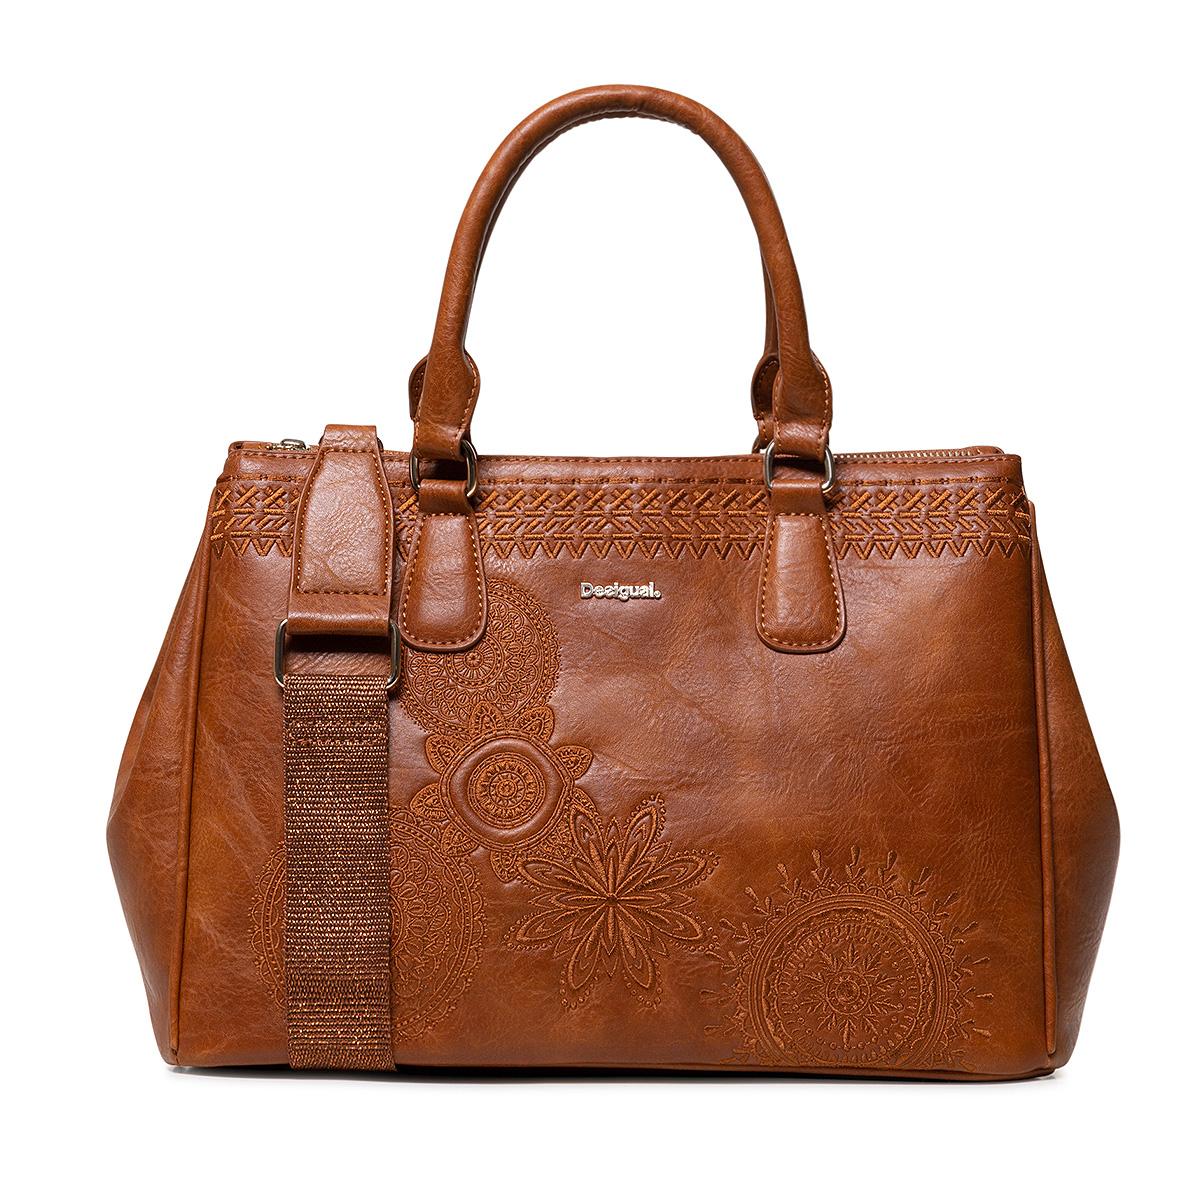 Desigual Handtasche Bowling Bag Bols Dark Amber Cabo 19SAXPCA